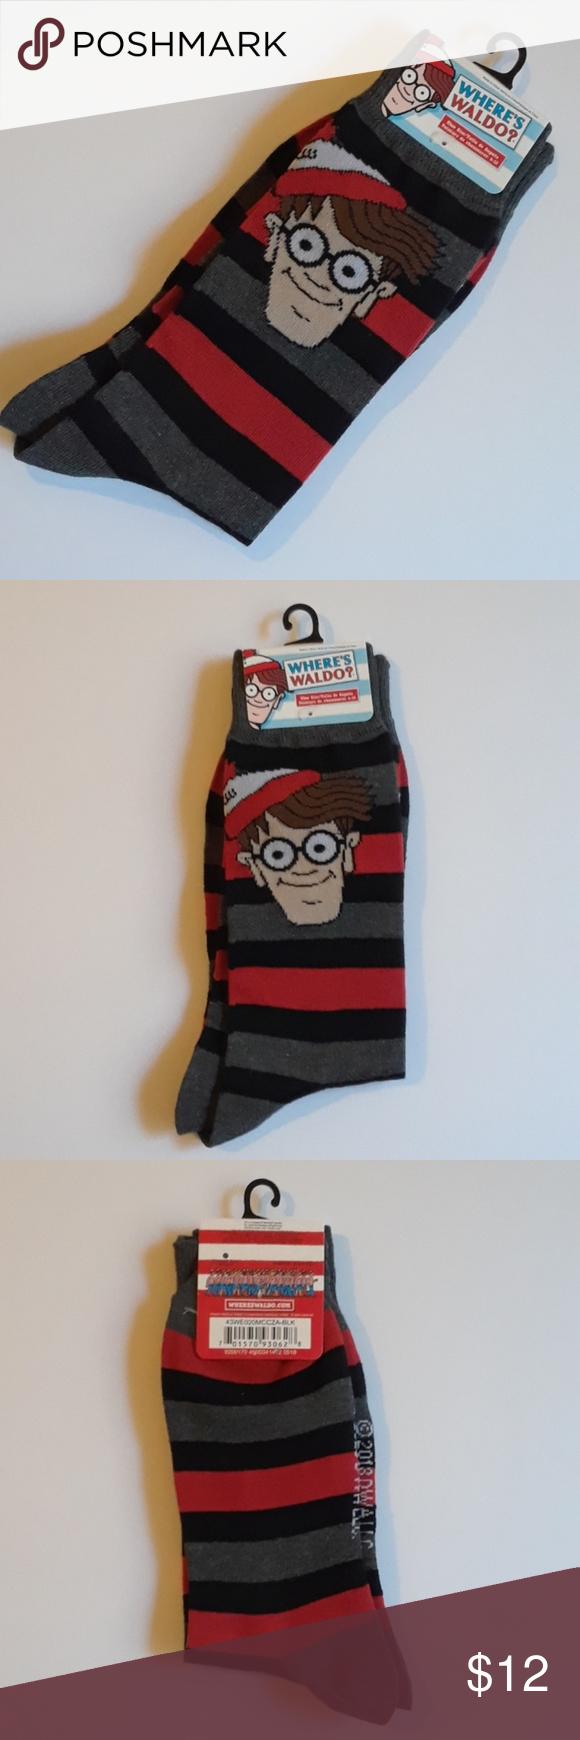 b6175663 Where's Waldo socks RARE Where's Waldo socks Great gift where's ...